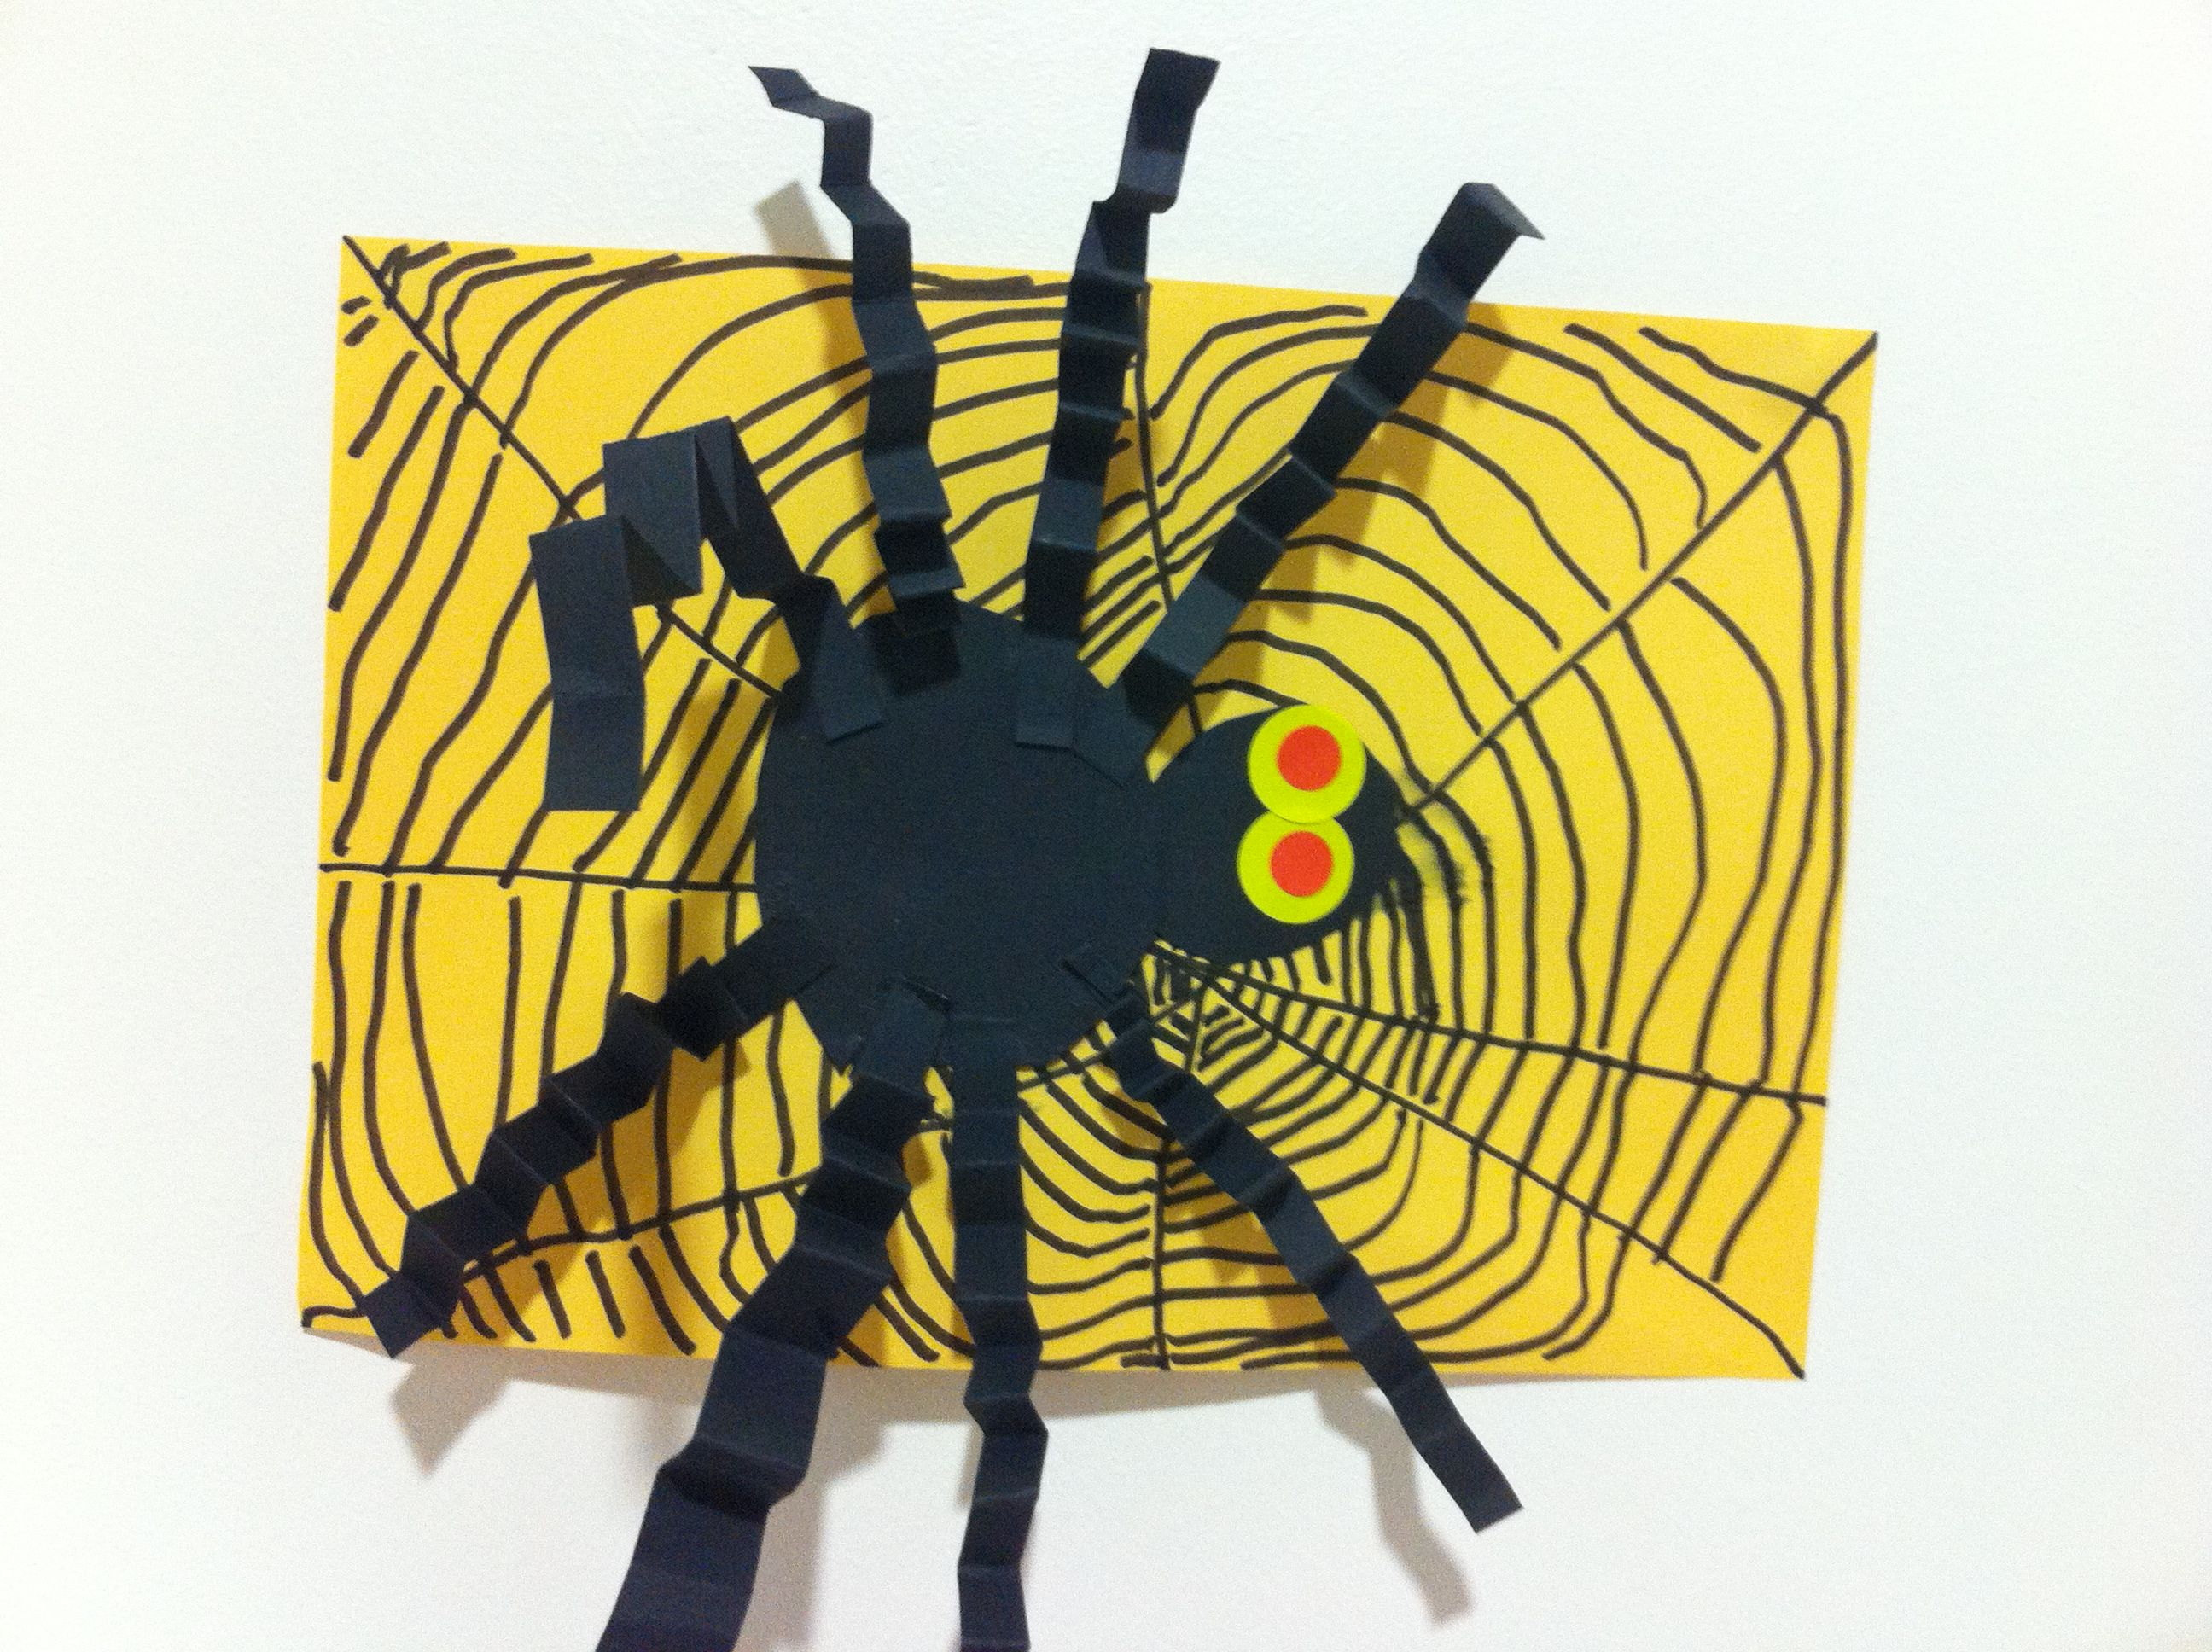 Toiles d'araignée Toile d'araignée, Araignée halloween